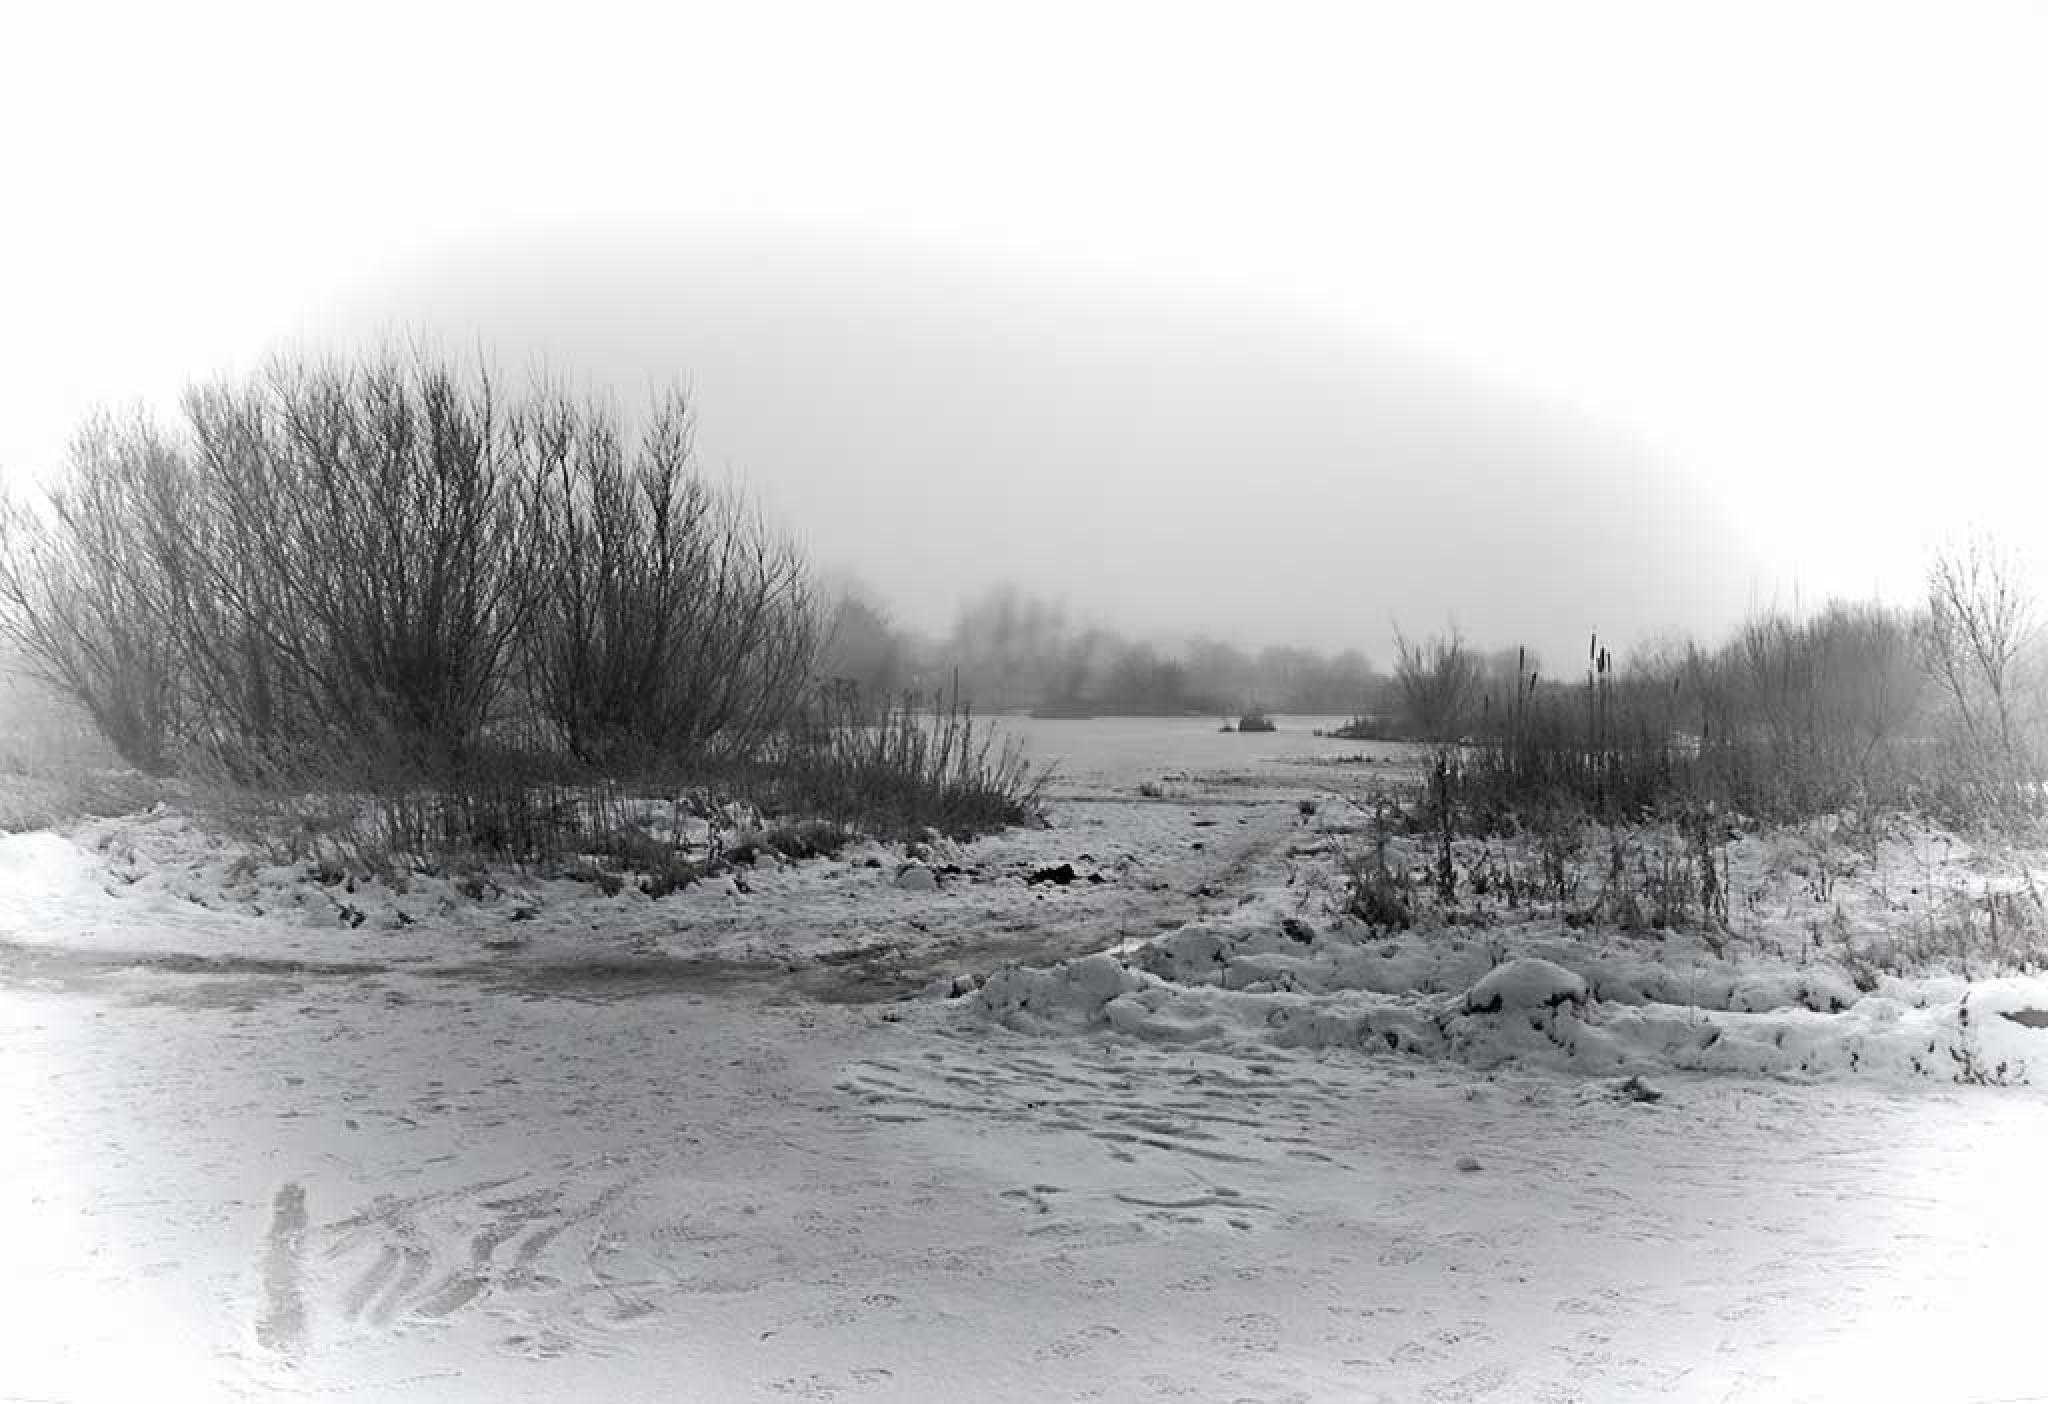 Foggy Day by jamesdawsonstraughan